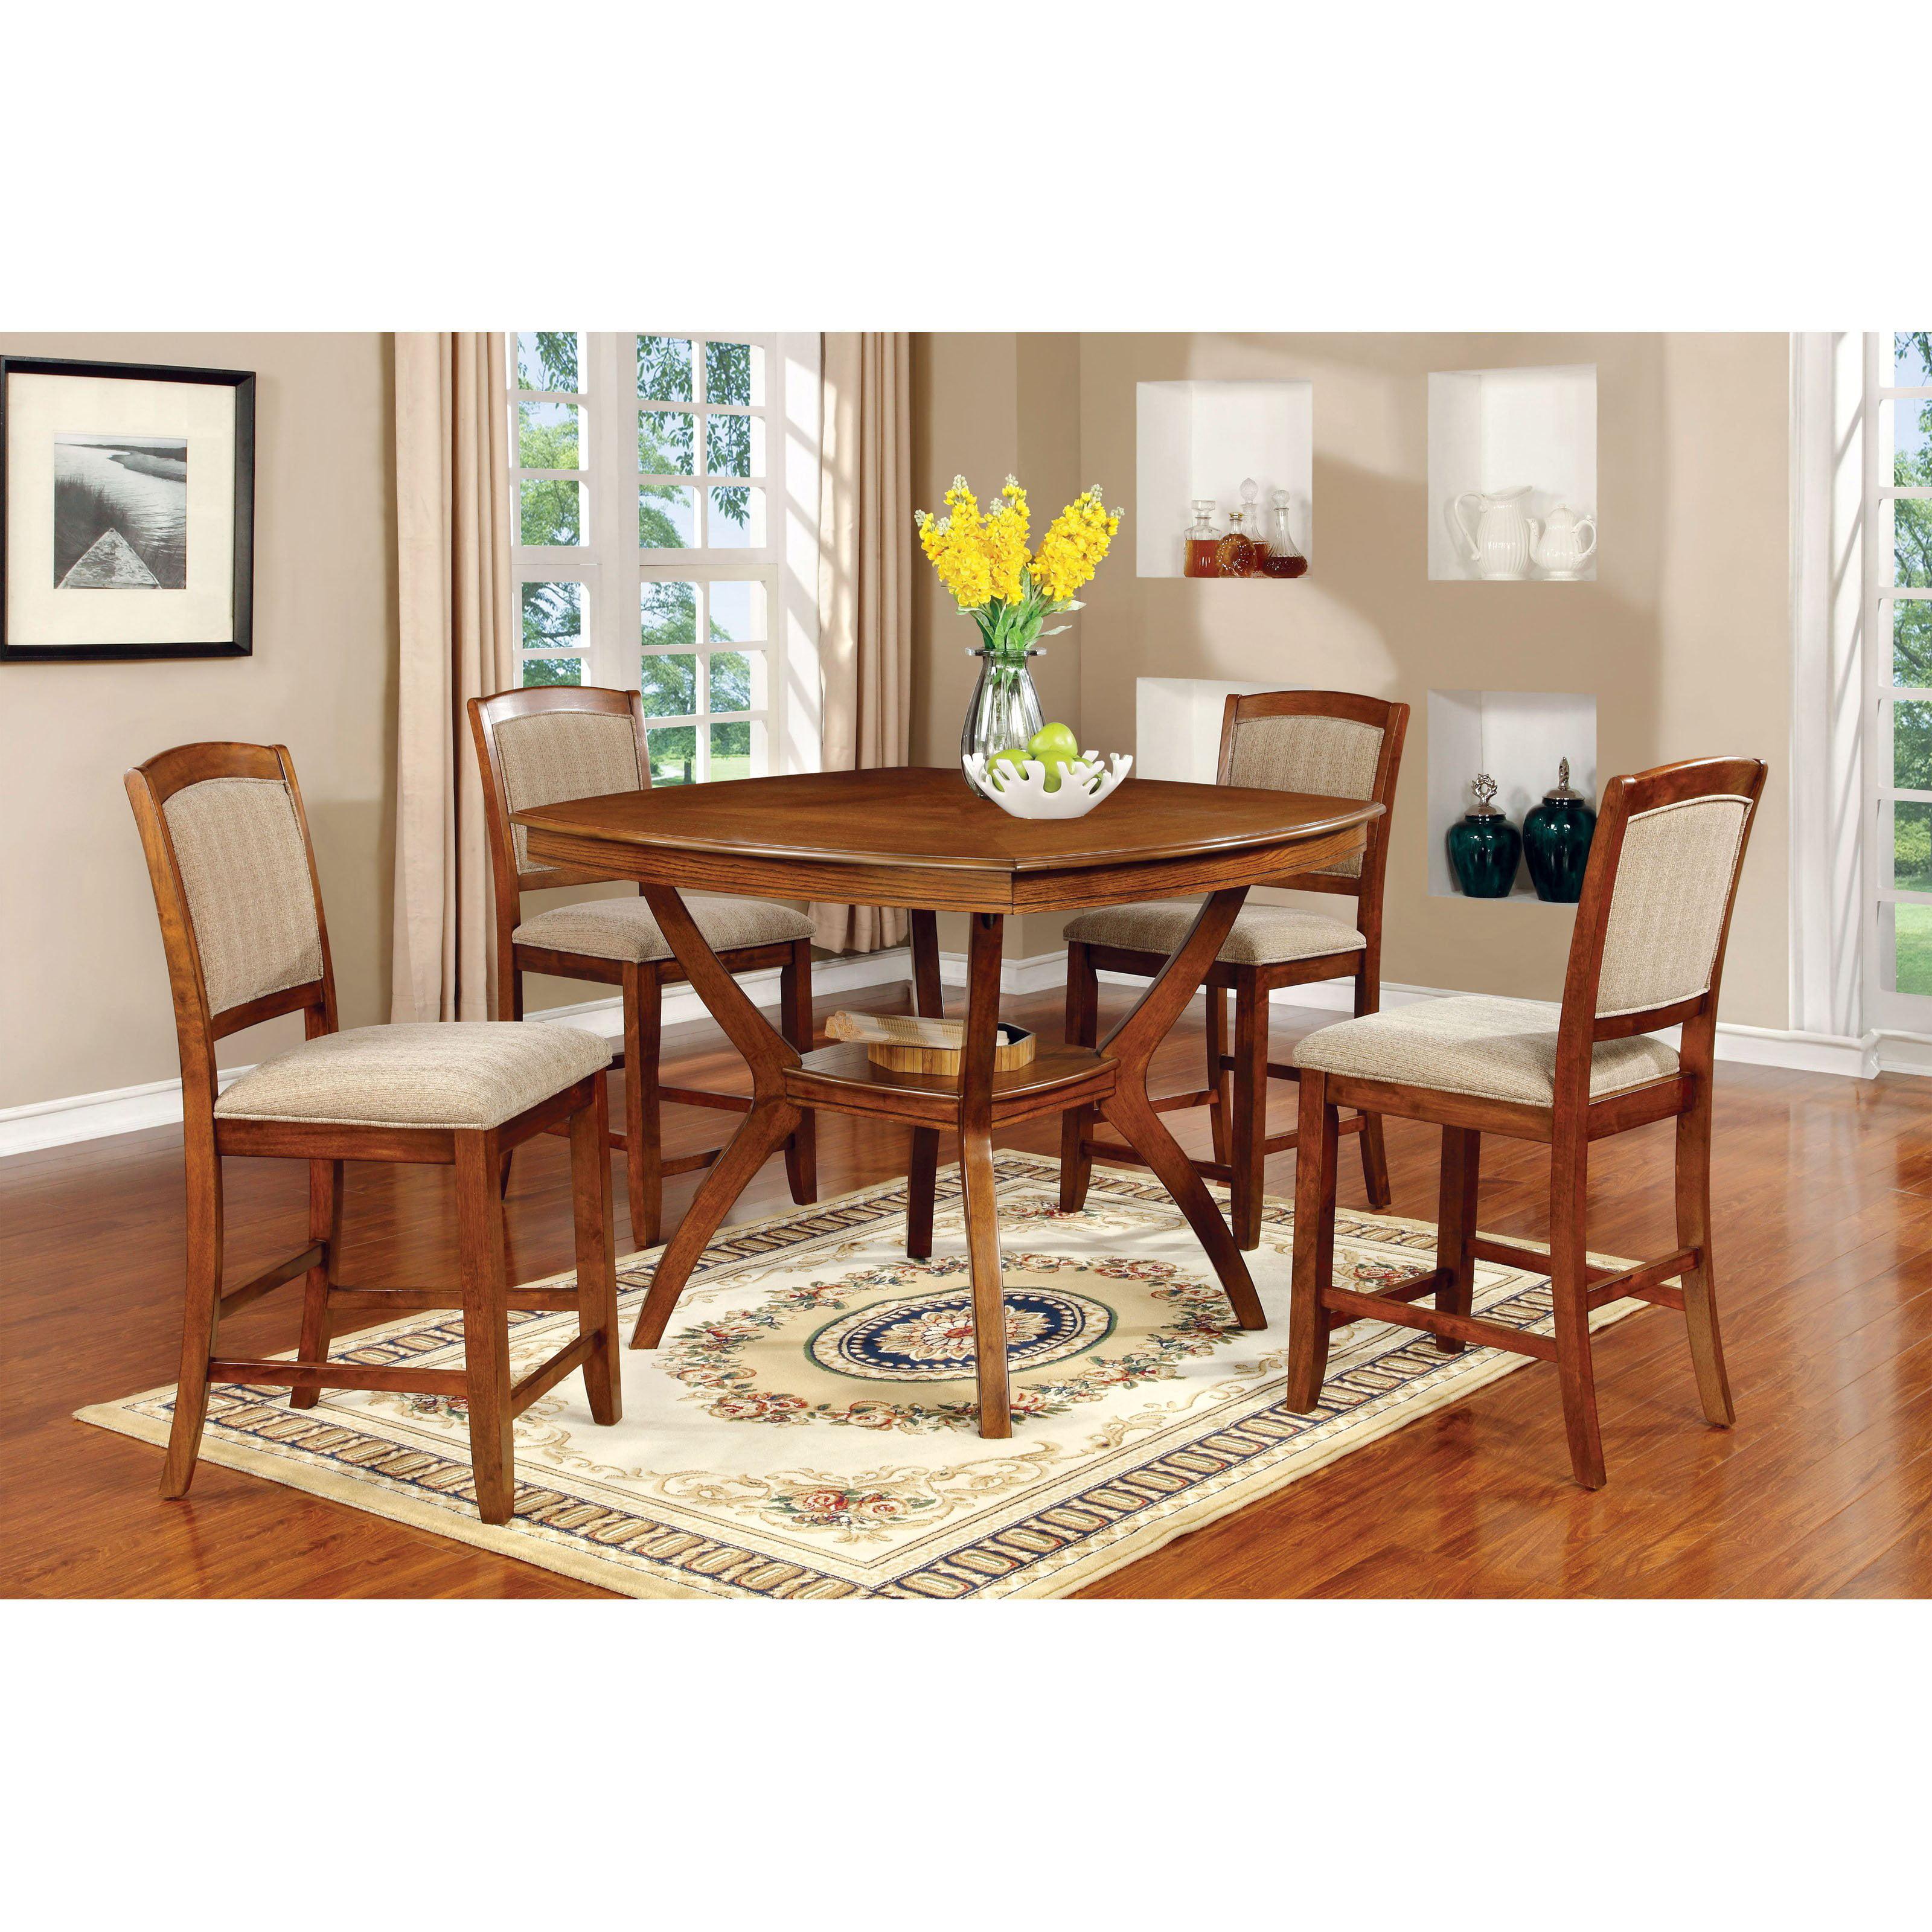 furniture of america halloran 5 piece counter height